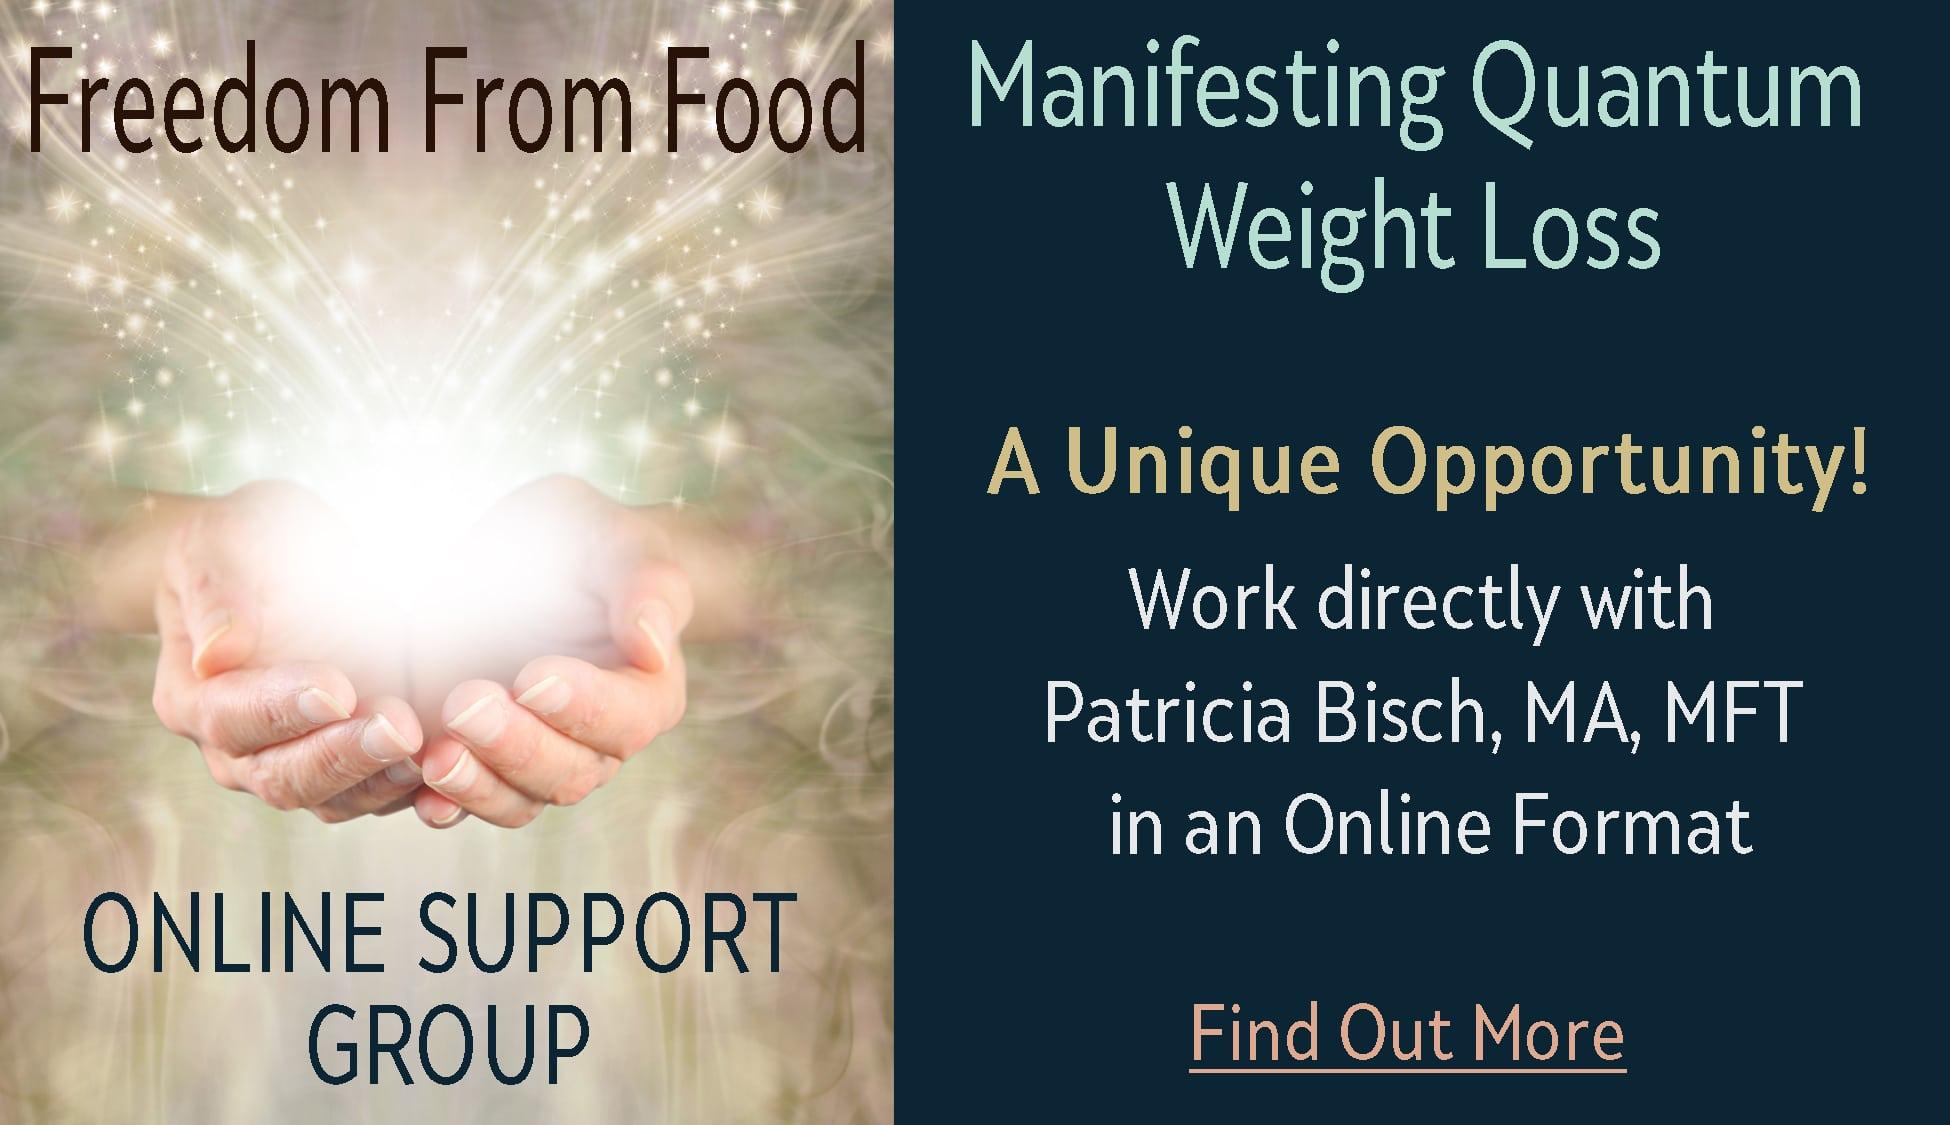 Manifesting Quantum Weight Loss